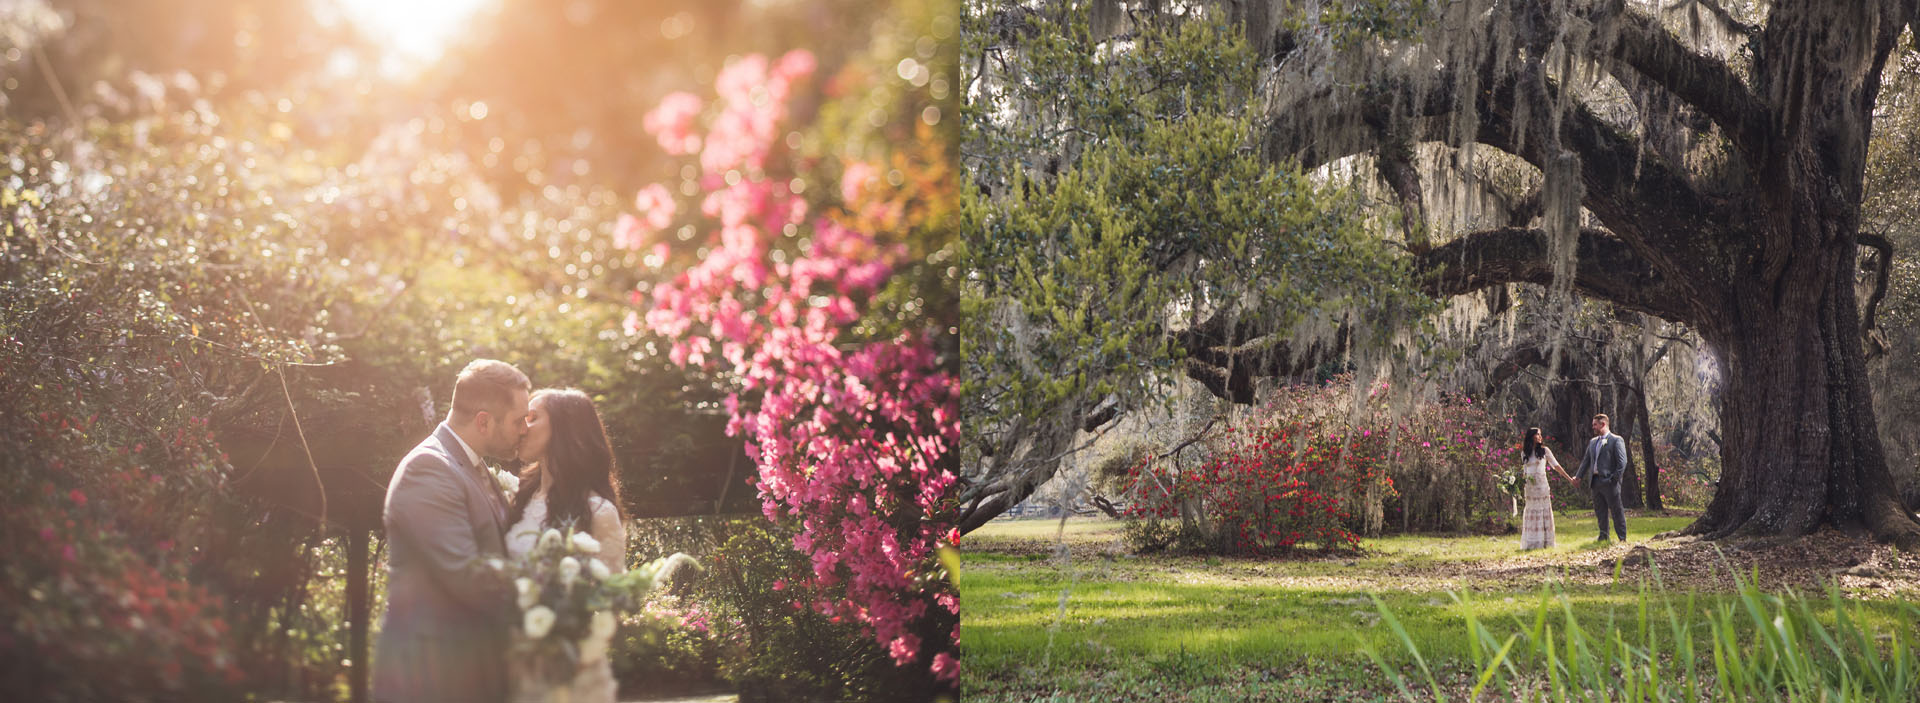 Magnolia Plantation Wedding During Azaleas